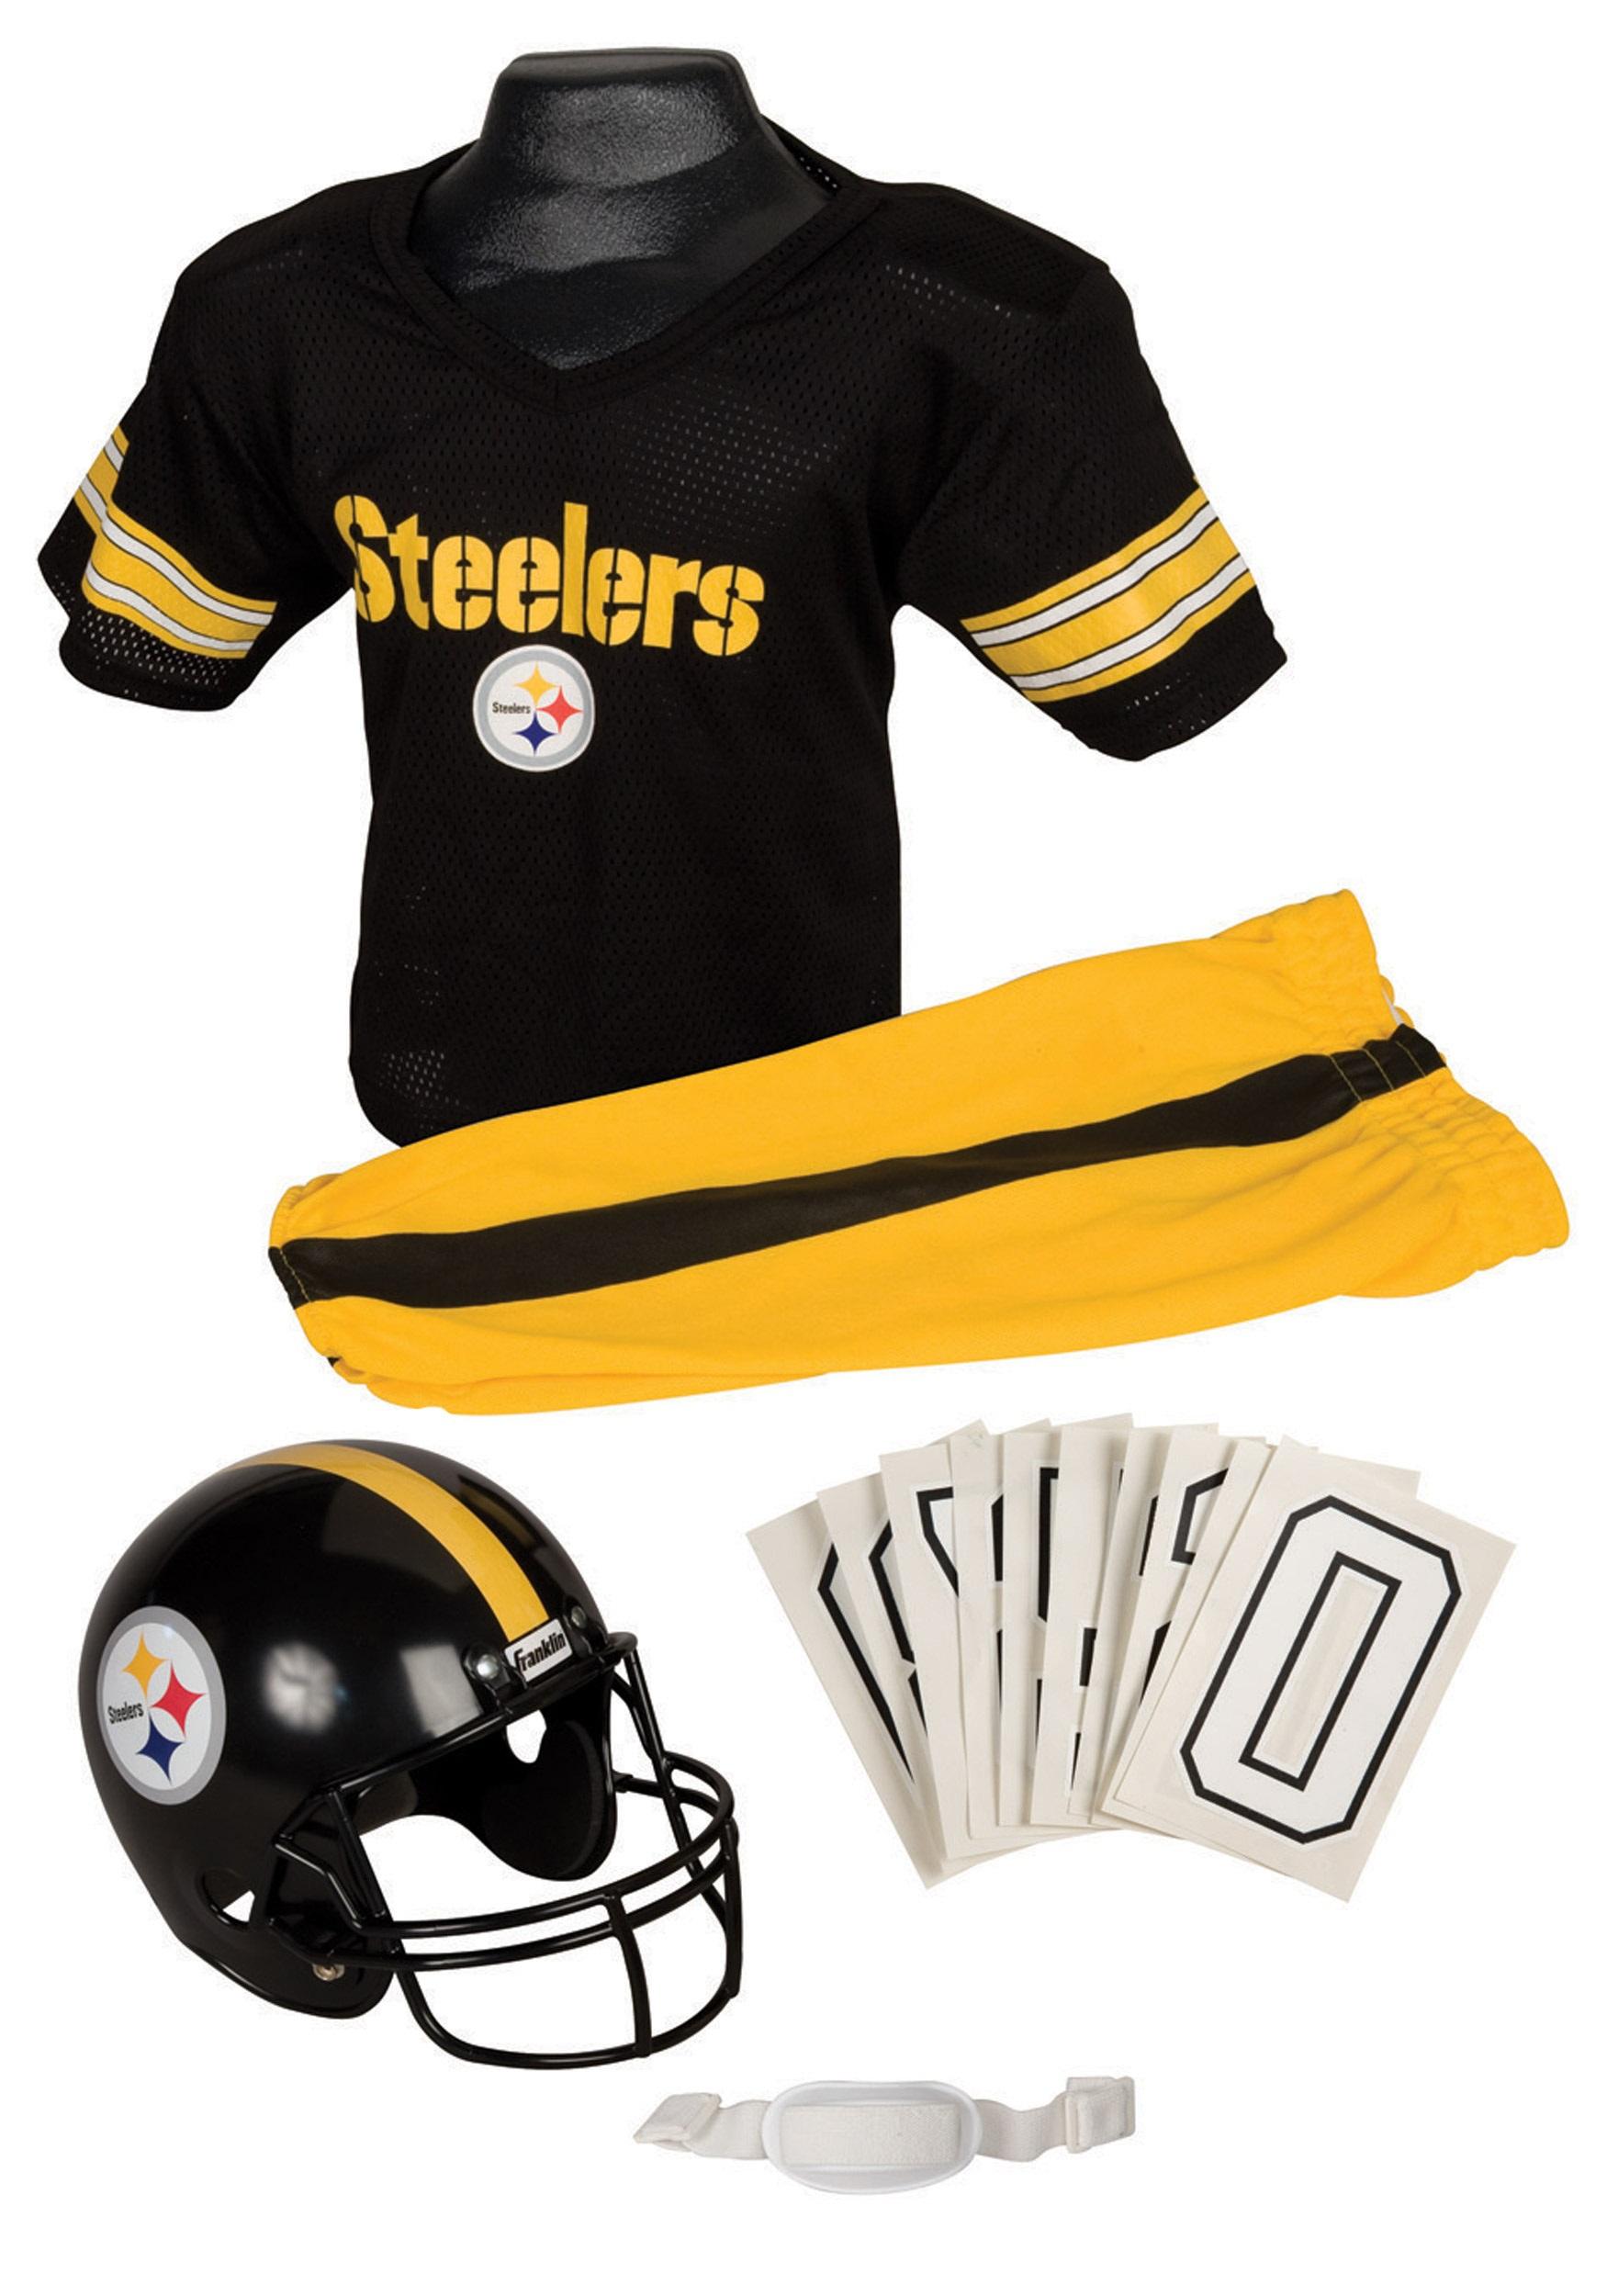 7a153694d32 Steelers NFL Uniform Costume